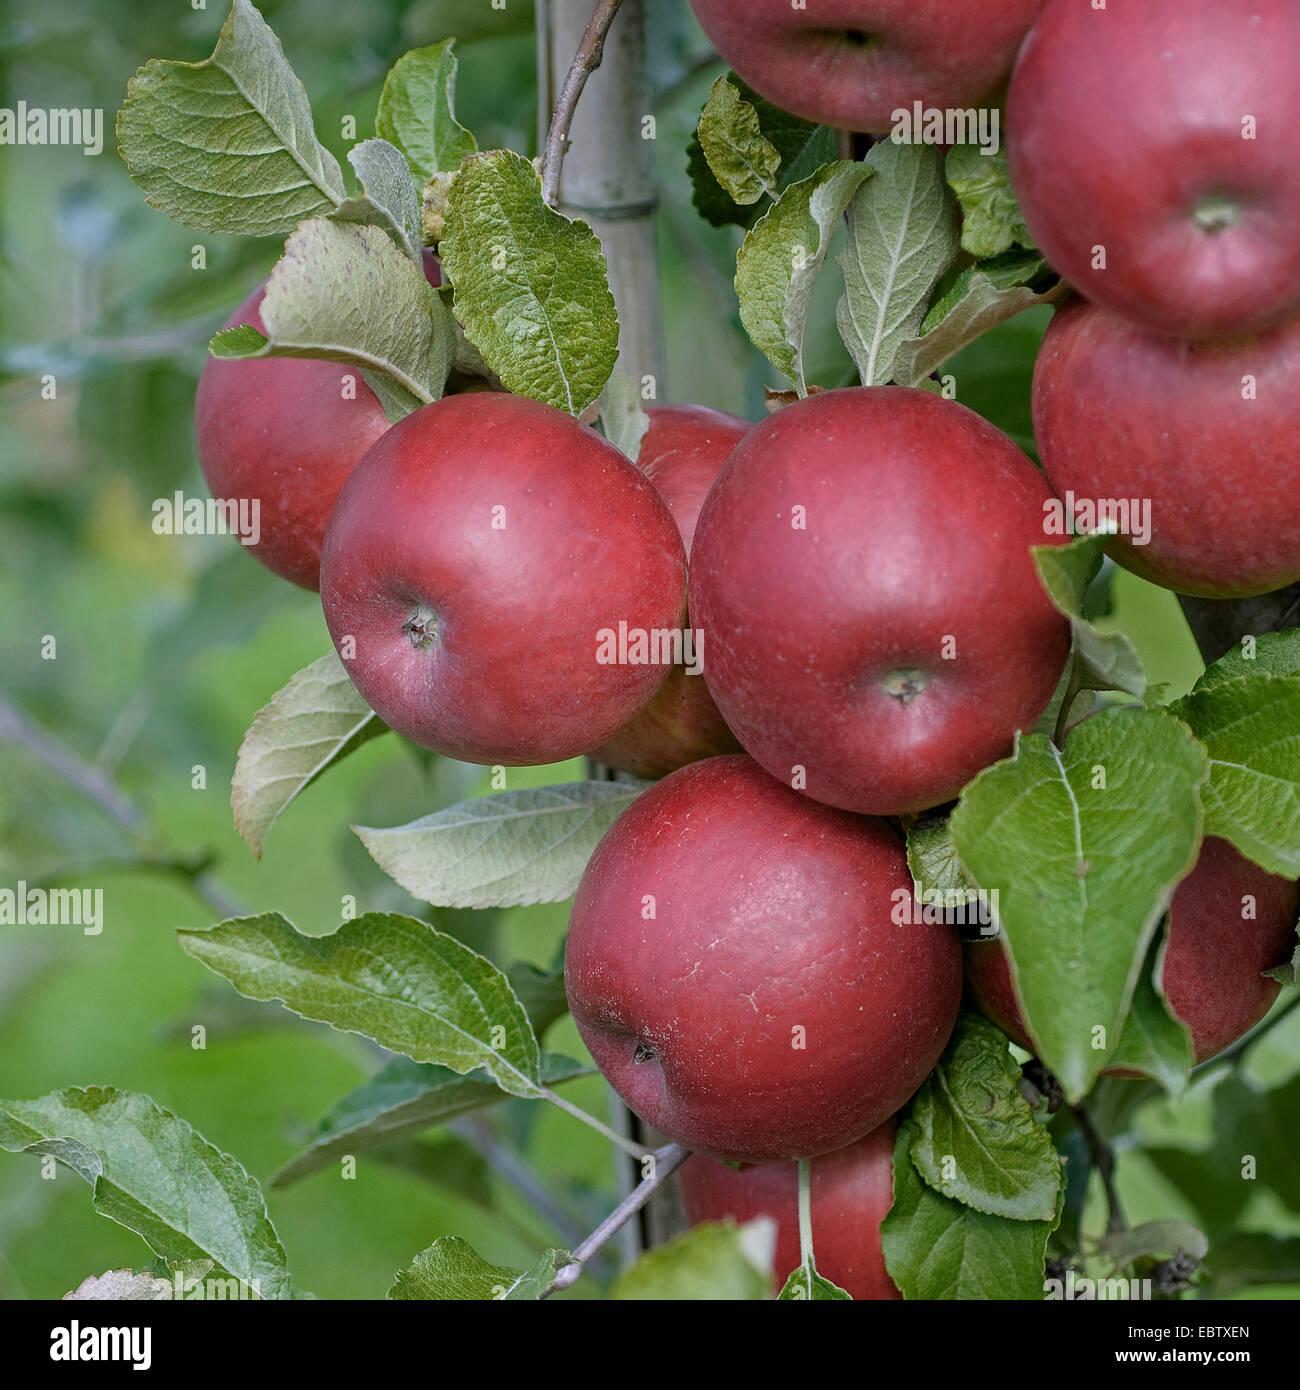 apple tree (Malus domestica 'Jonathan', Malus domestica Jonathan), cultivar Jonathan, apples on a tree - Stock Image